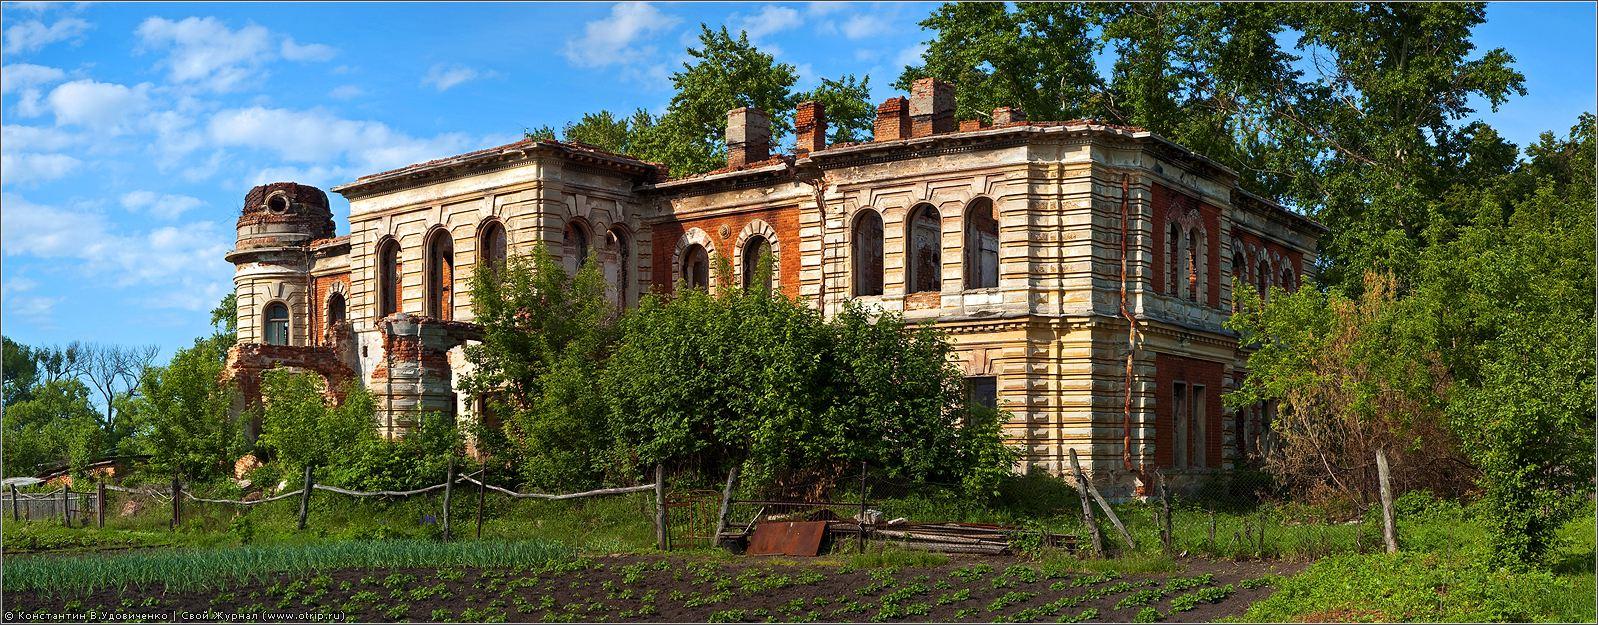 0922-6151x3050s_2.jpg - Липецкая и Тульская области (30.05.2010)